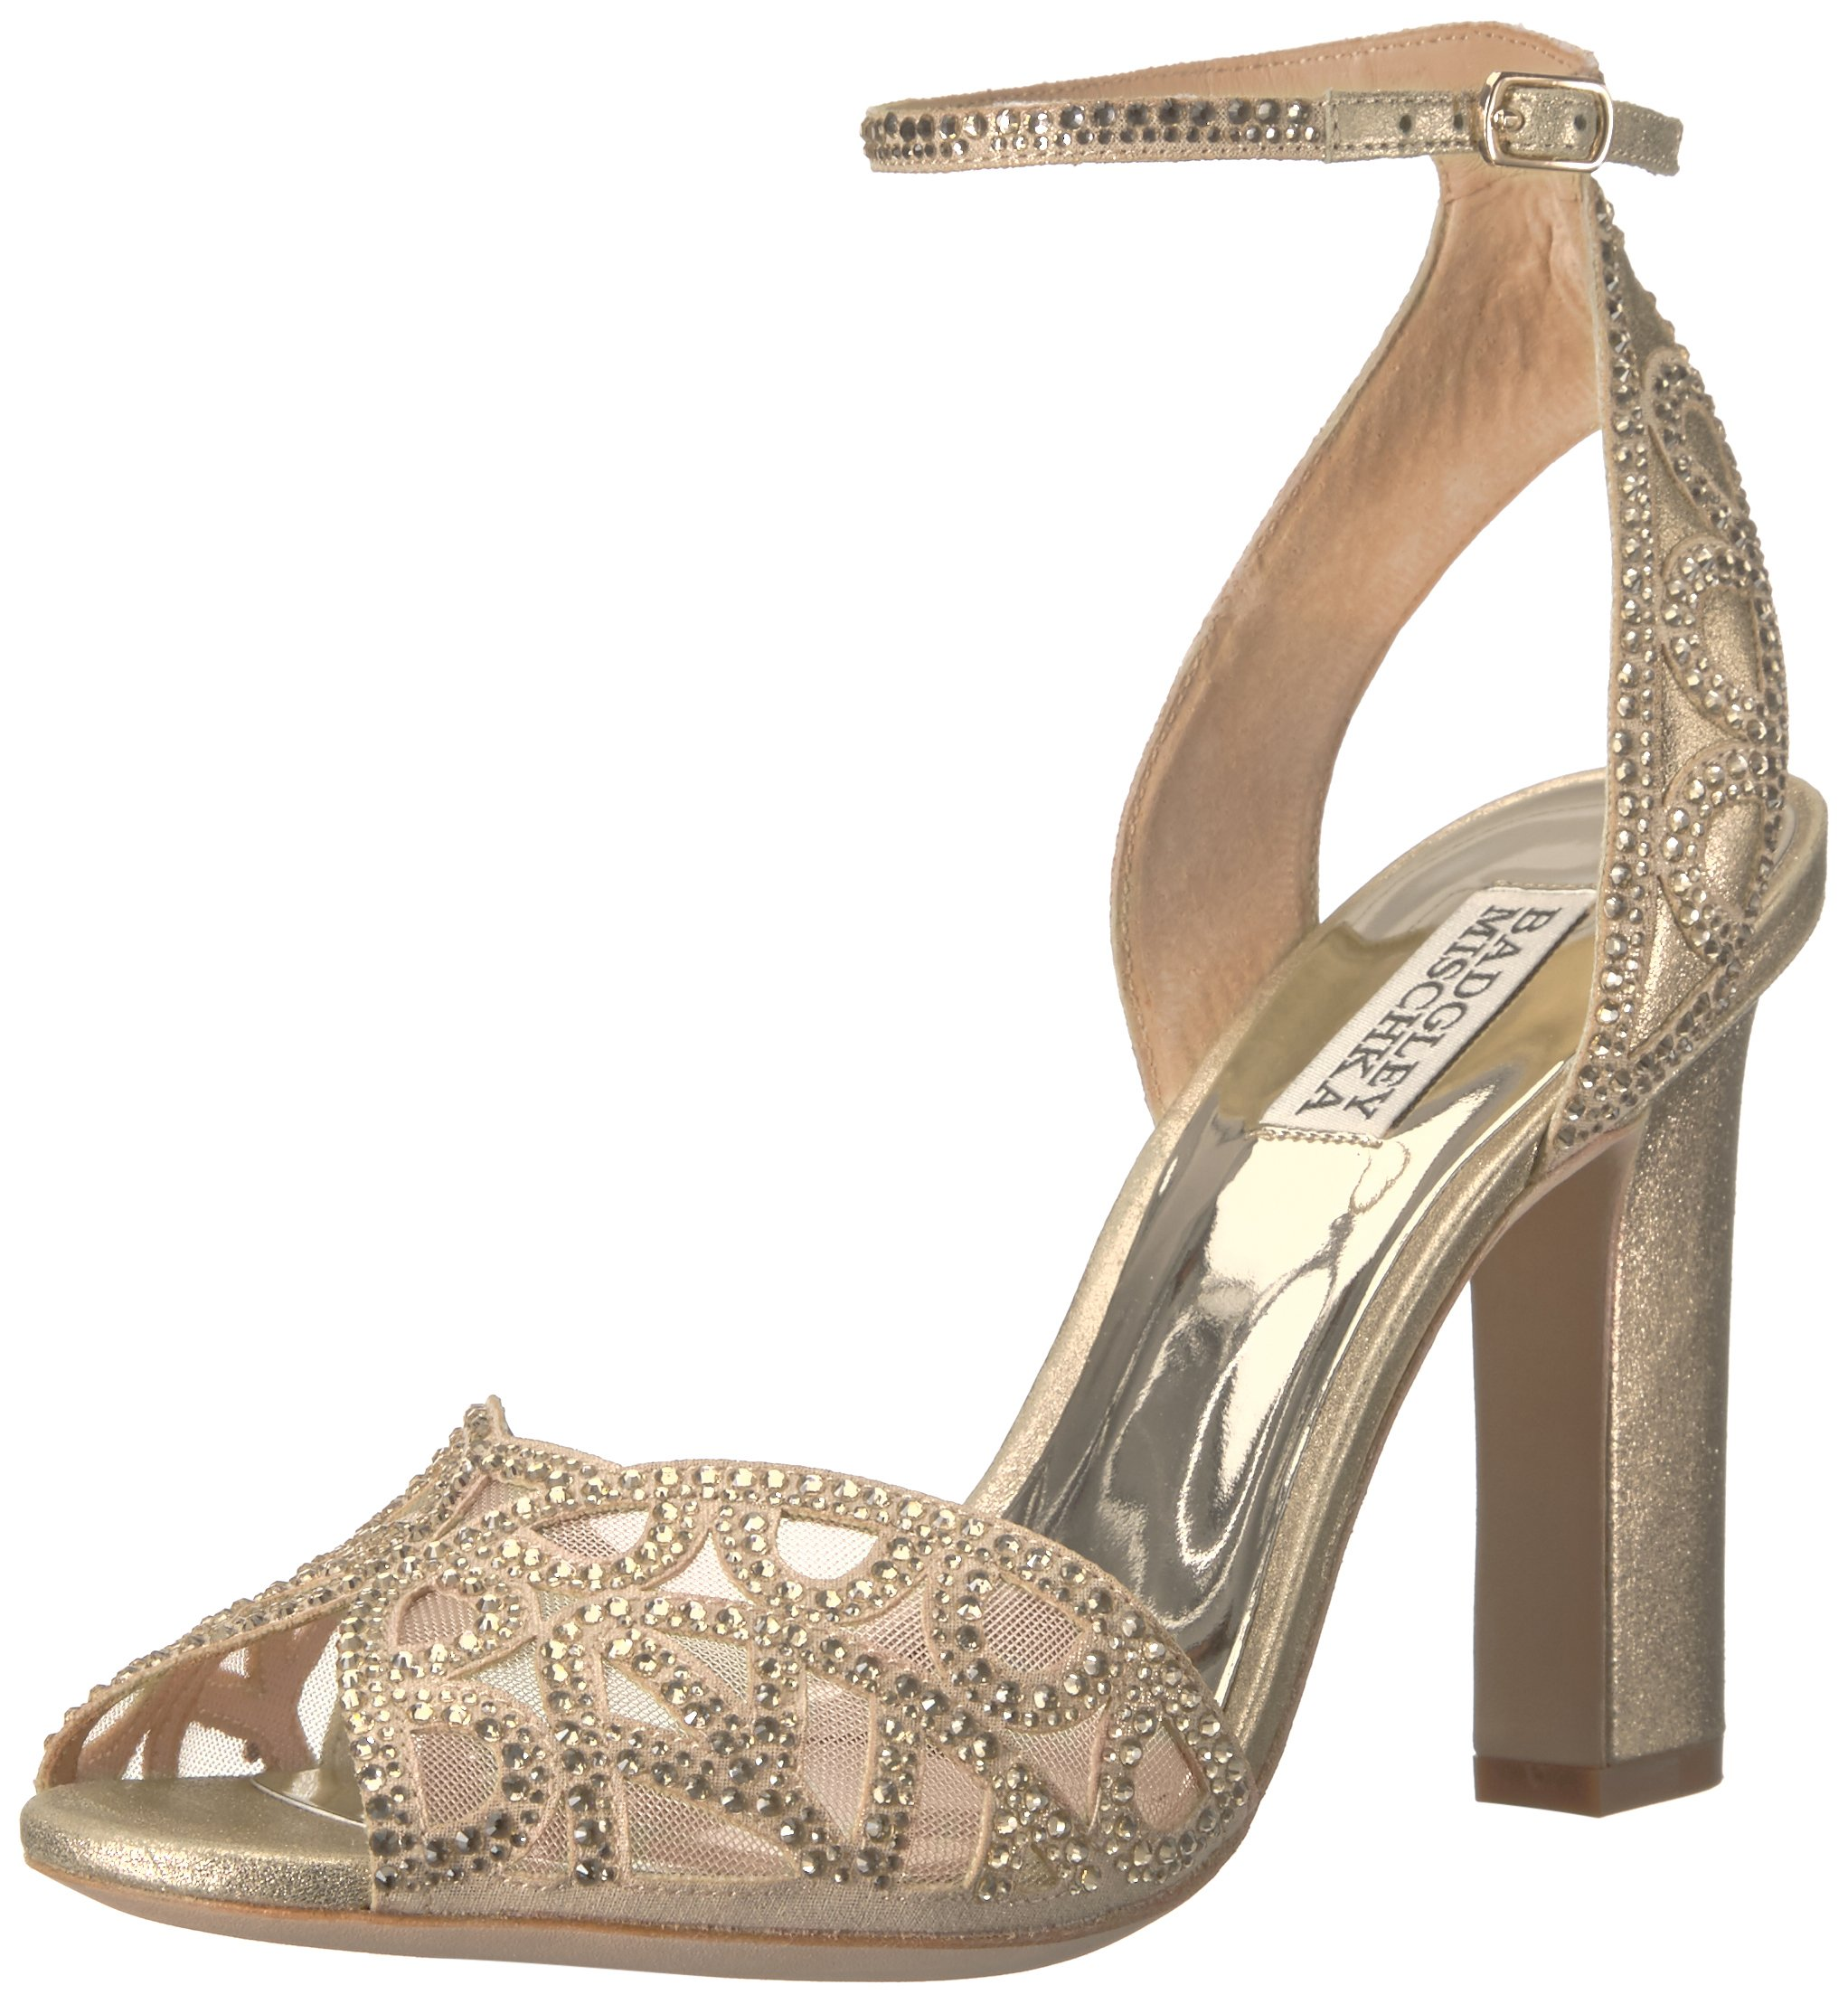 Badgley Mischka Women's Hart Heeled Sandal, Platino, 10 M US